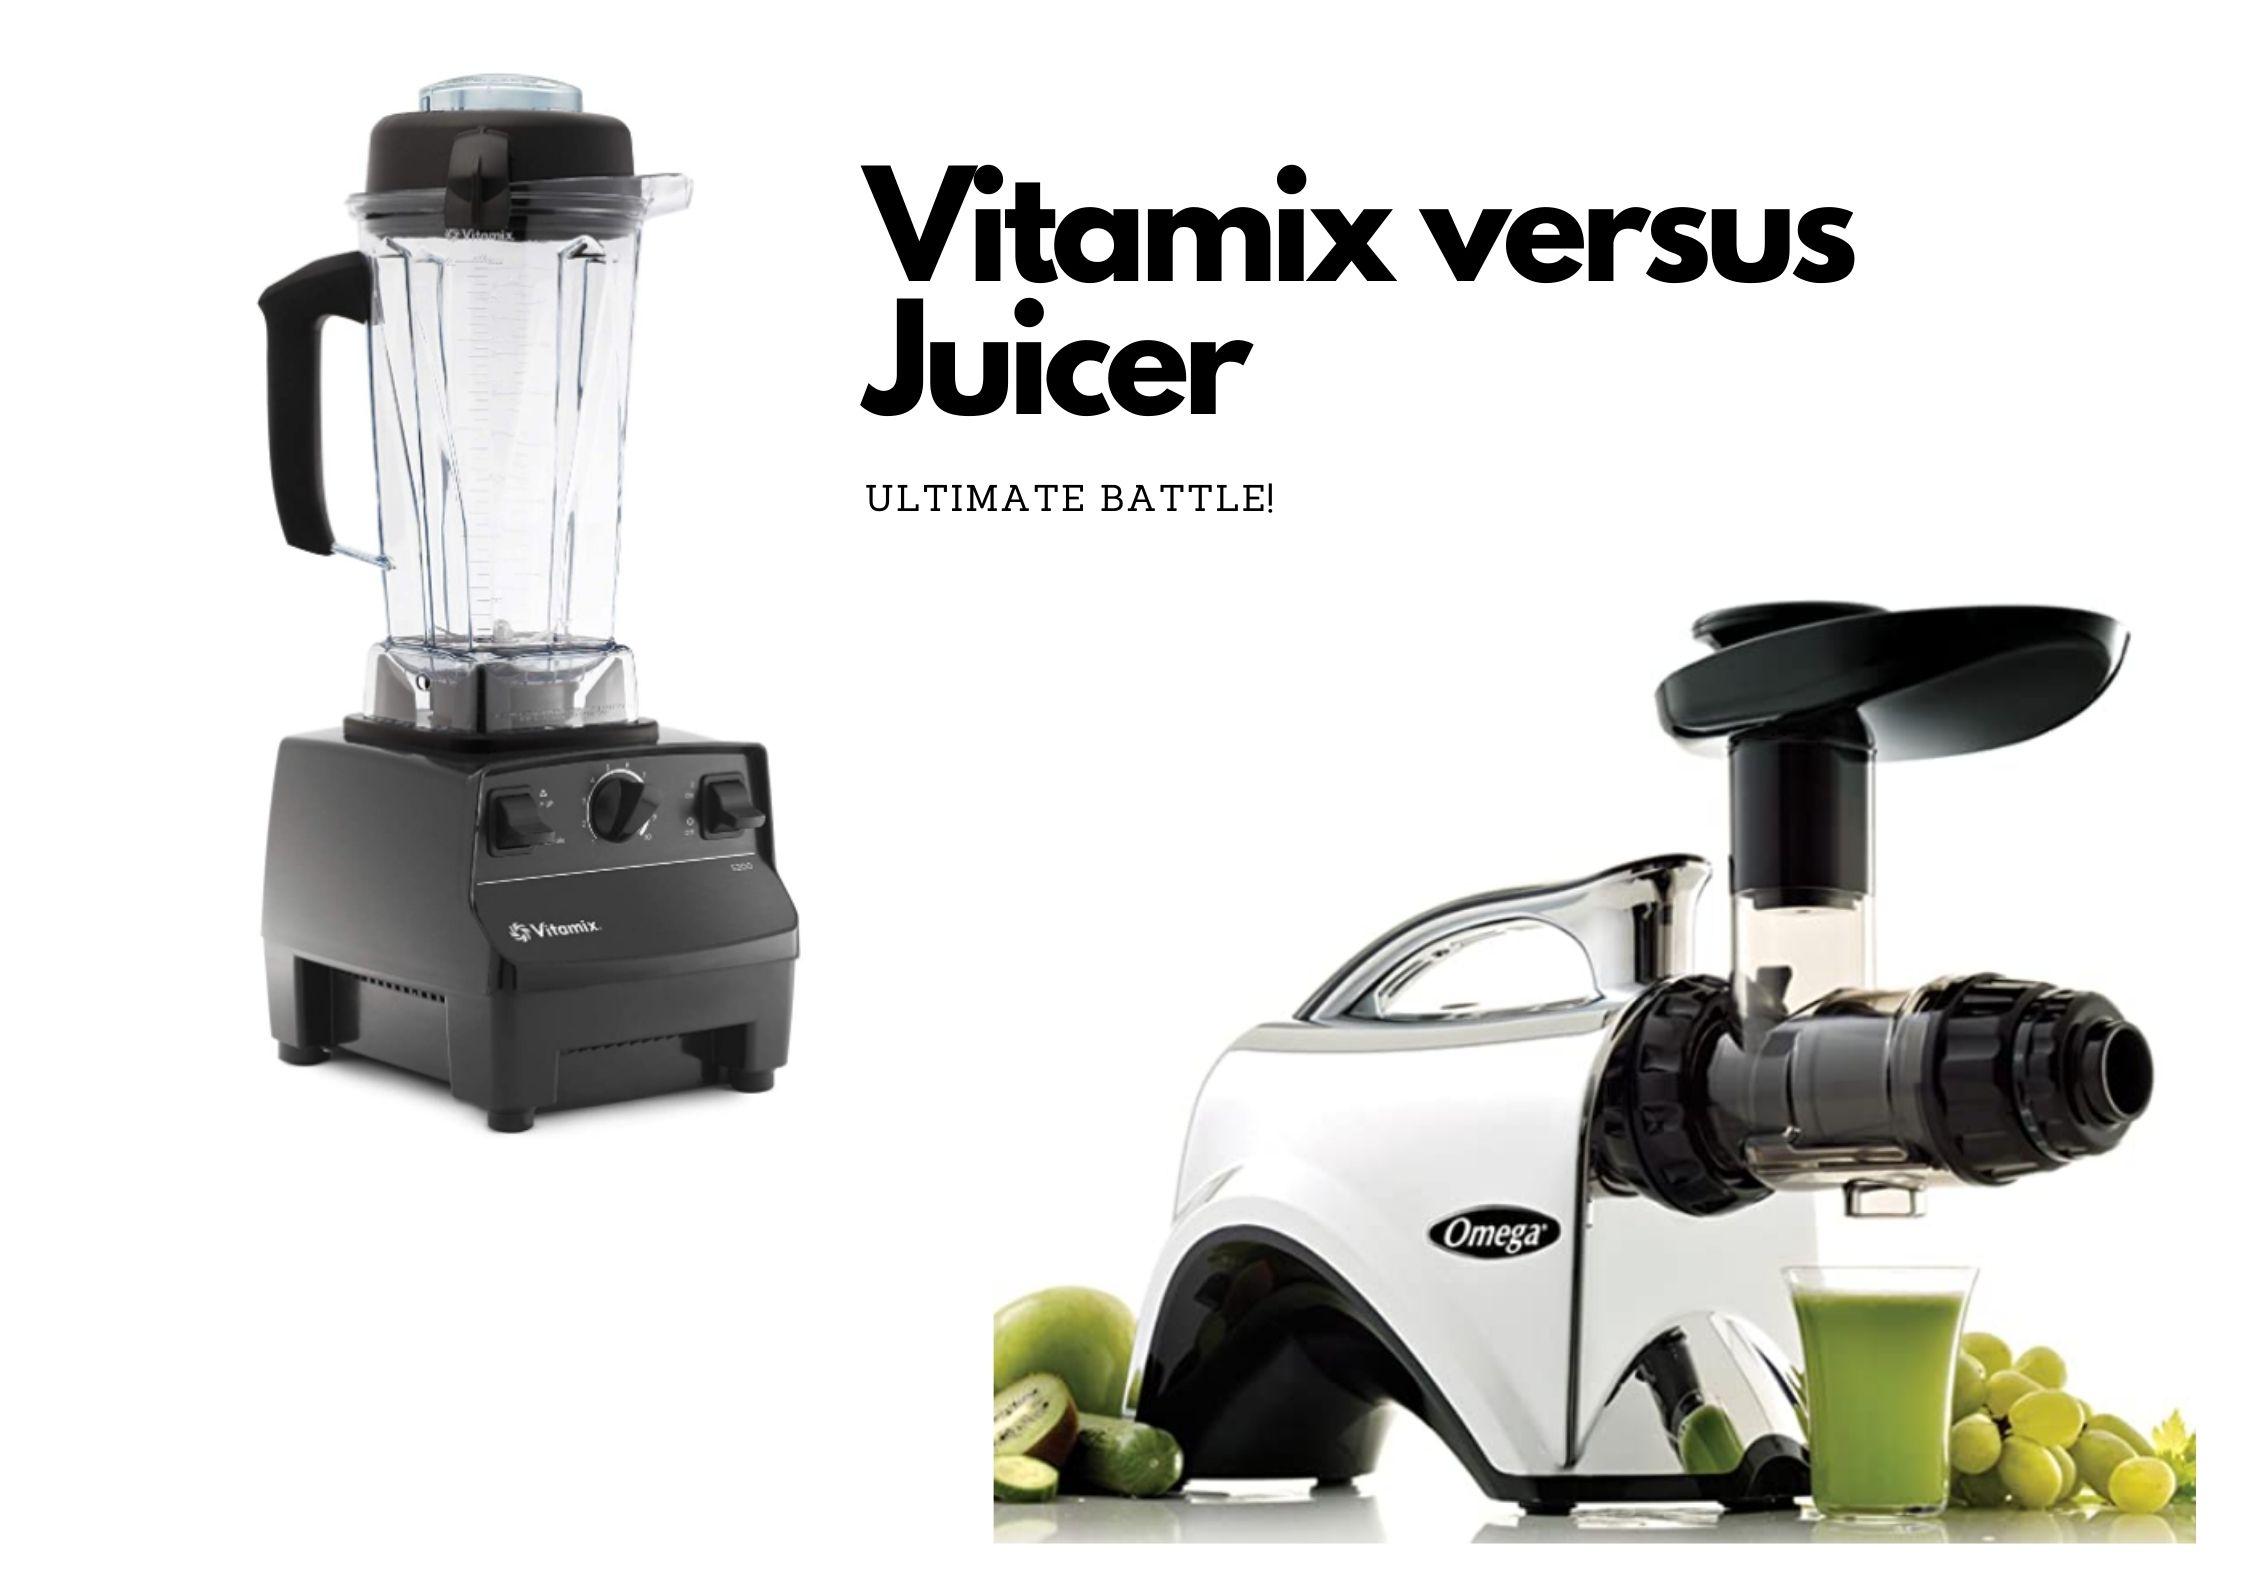 Vitamix Versus Juicer - Ultimate Battle!